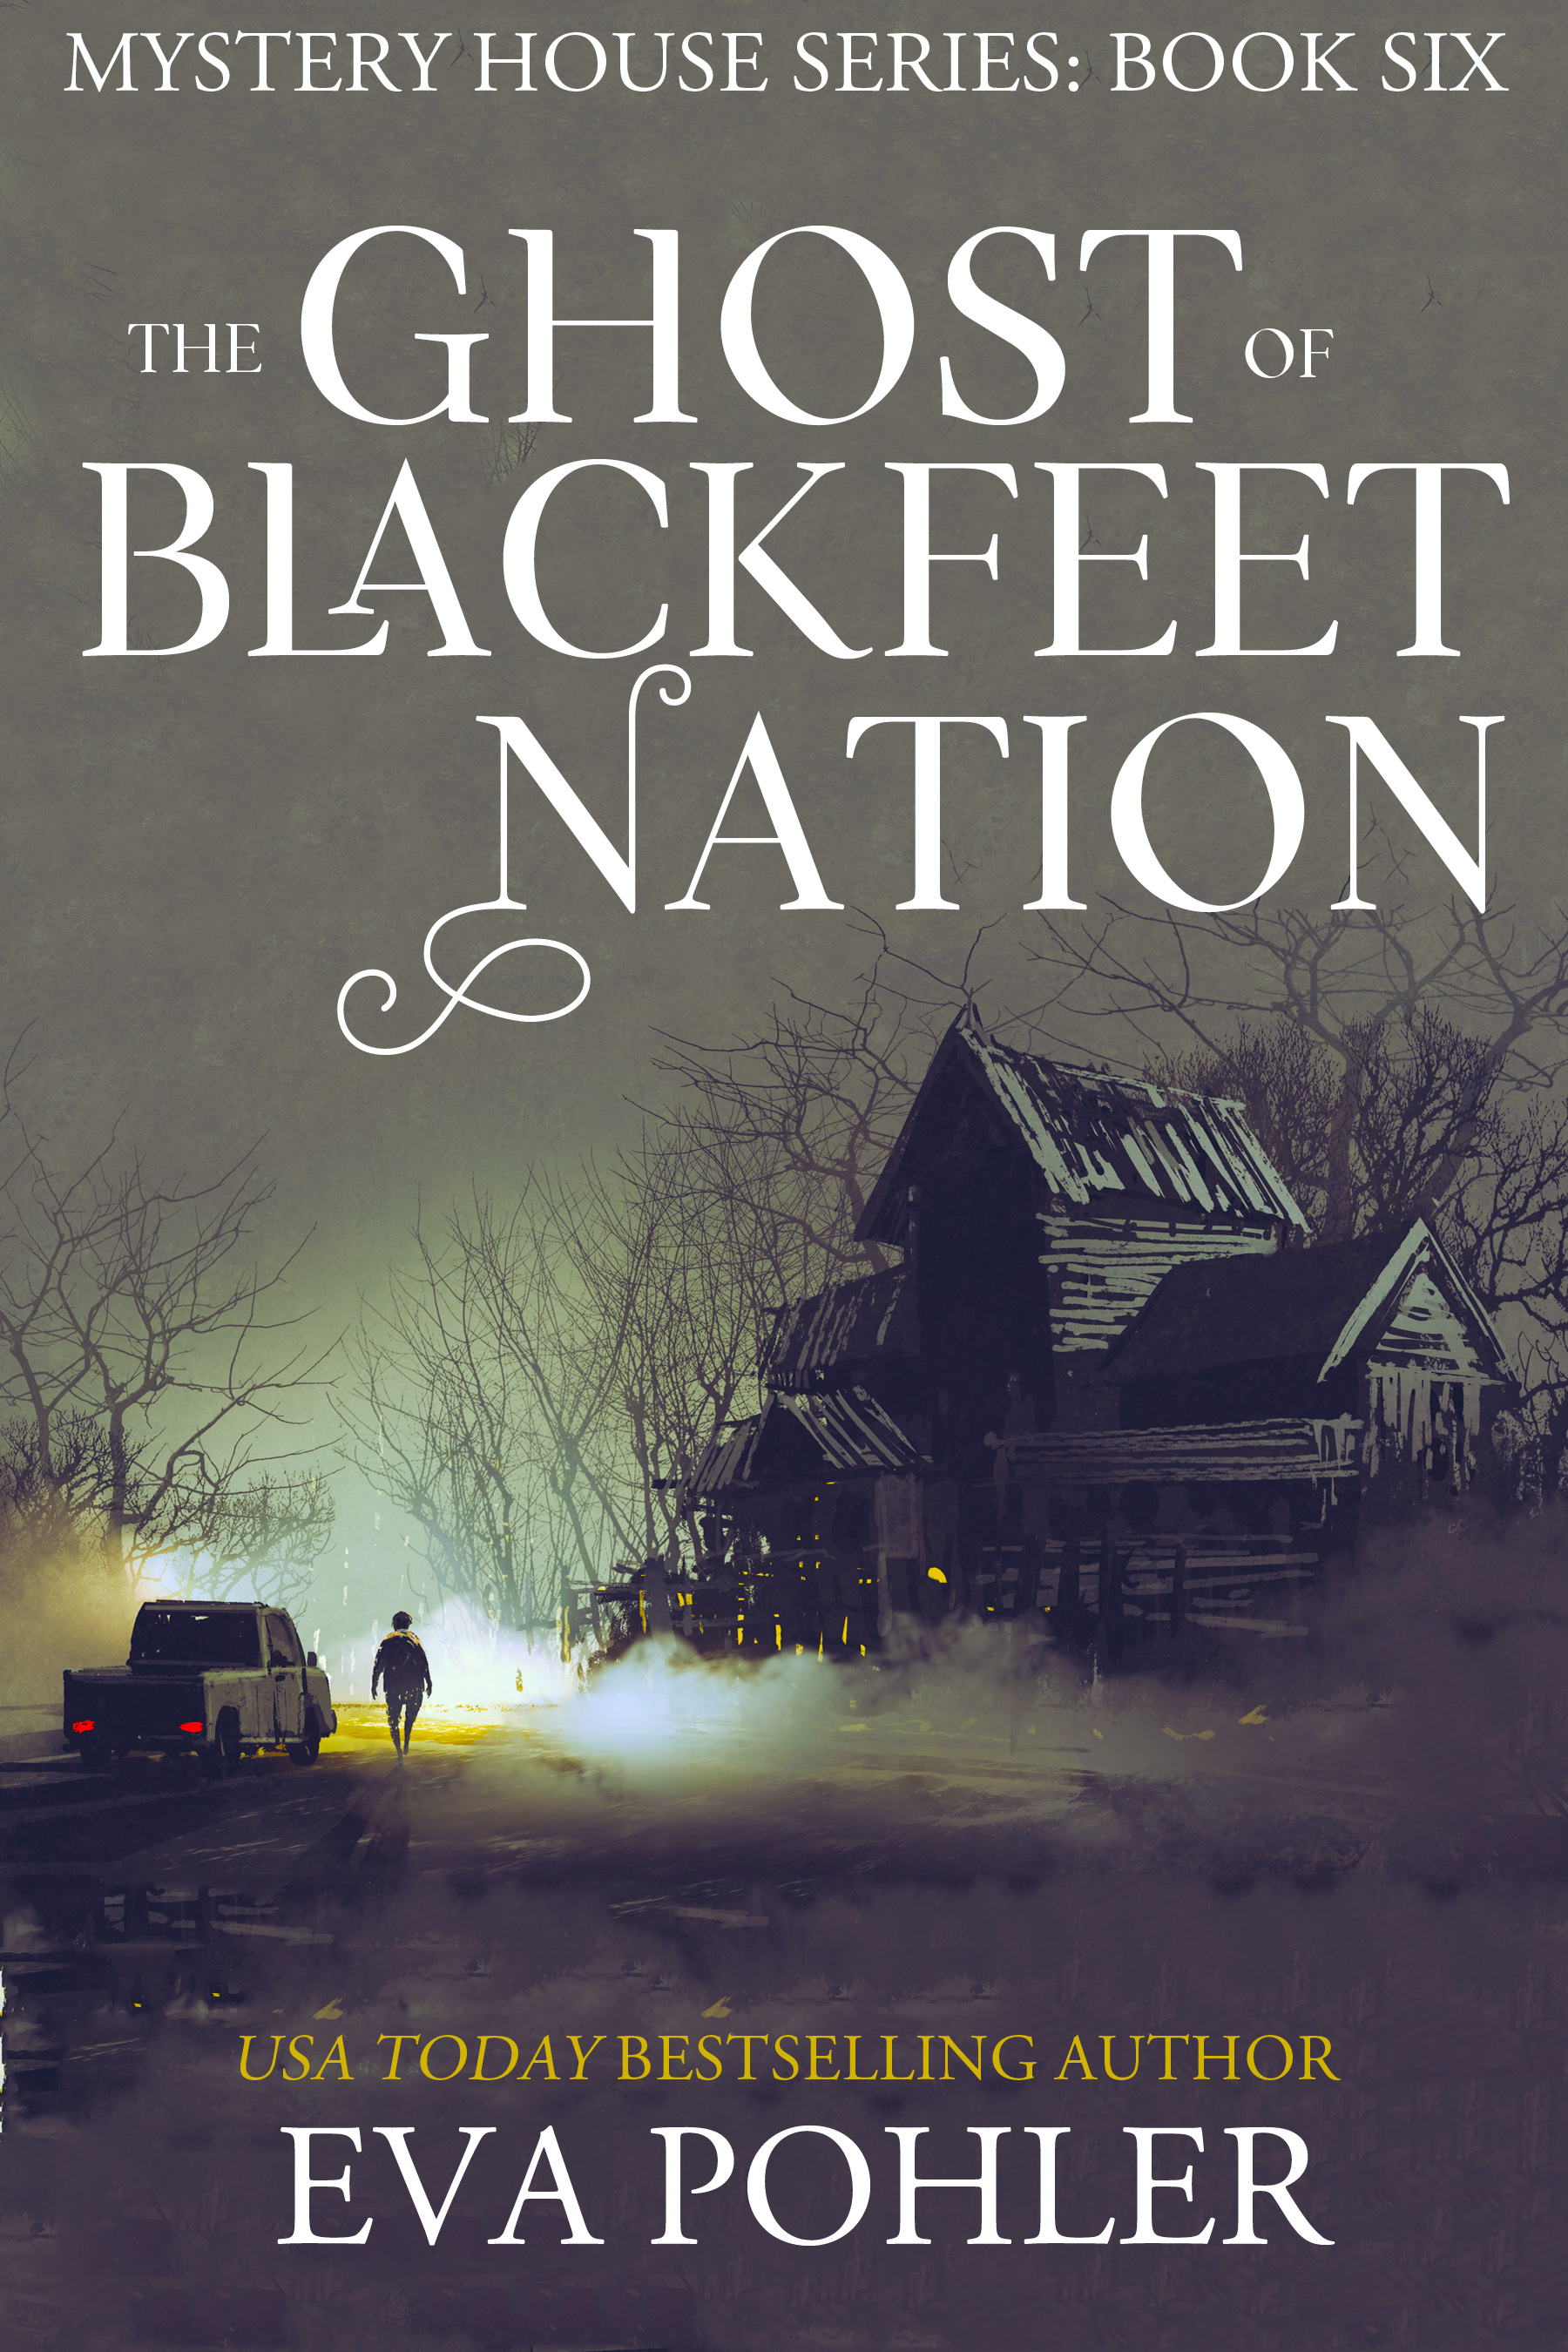 [PDF] [EPUB] The Ghost of Blackfeet Nation (Mystery House #6) Download by Eva Pohler